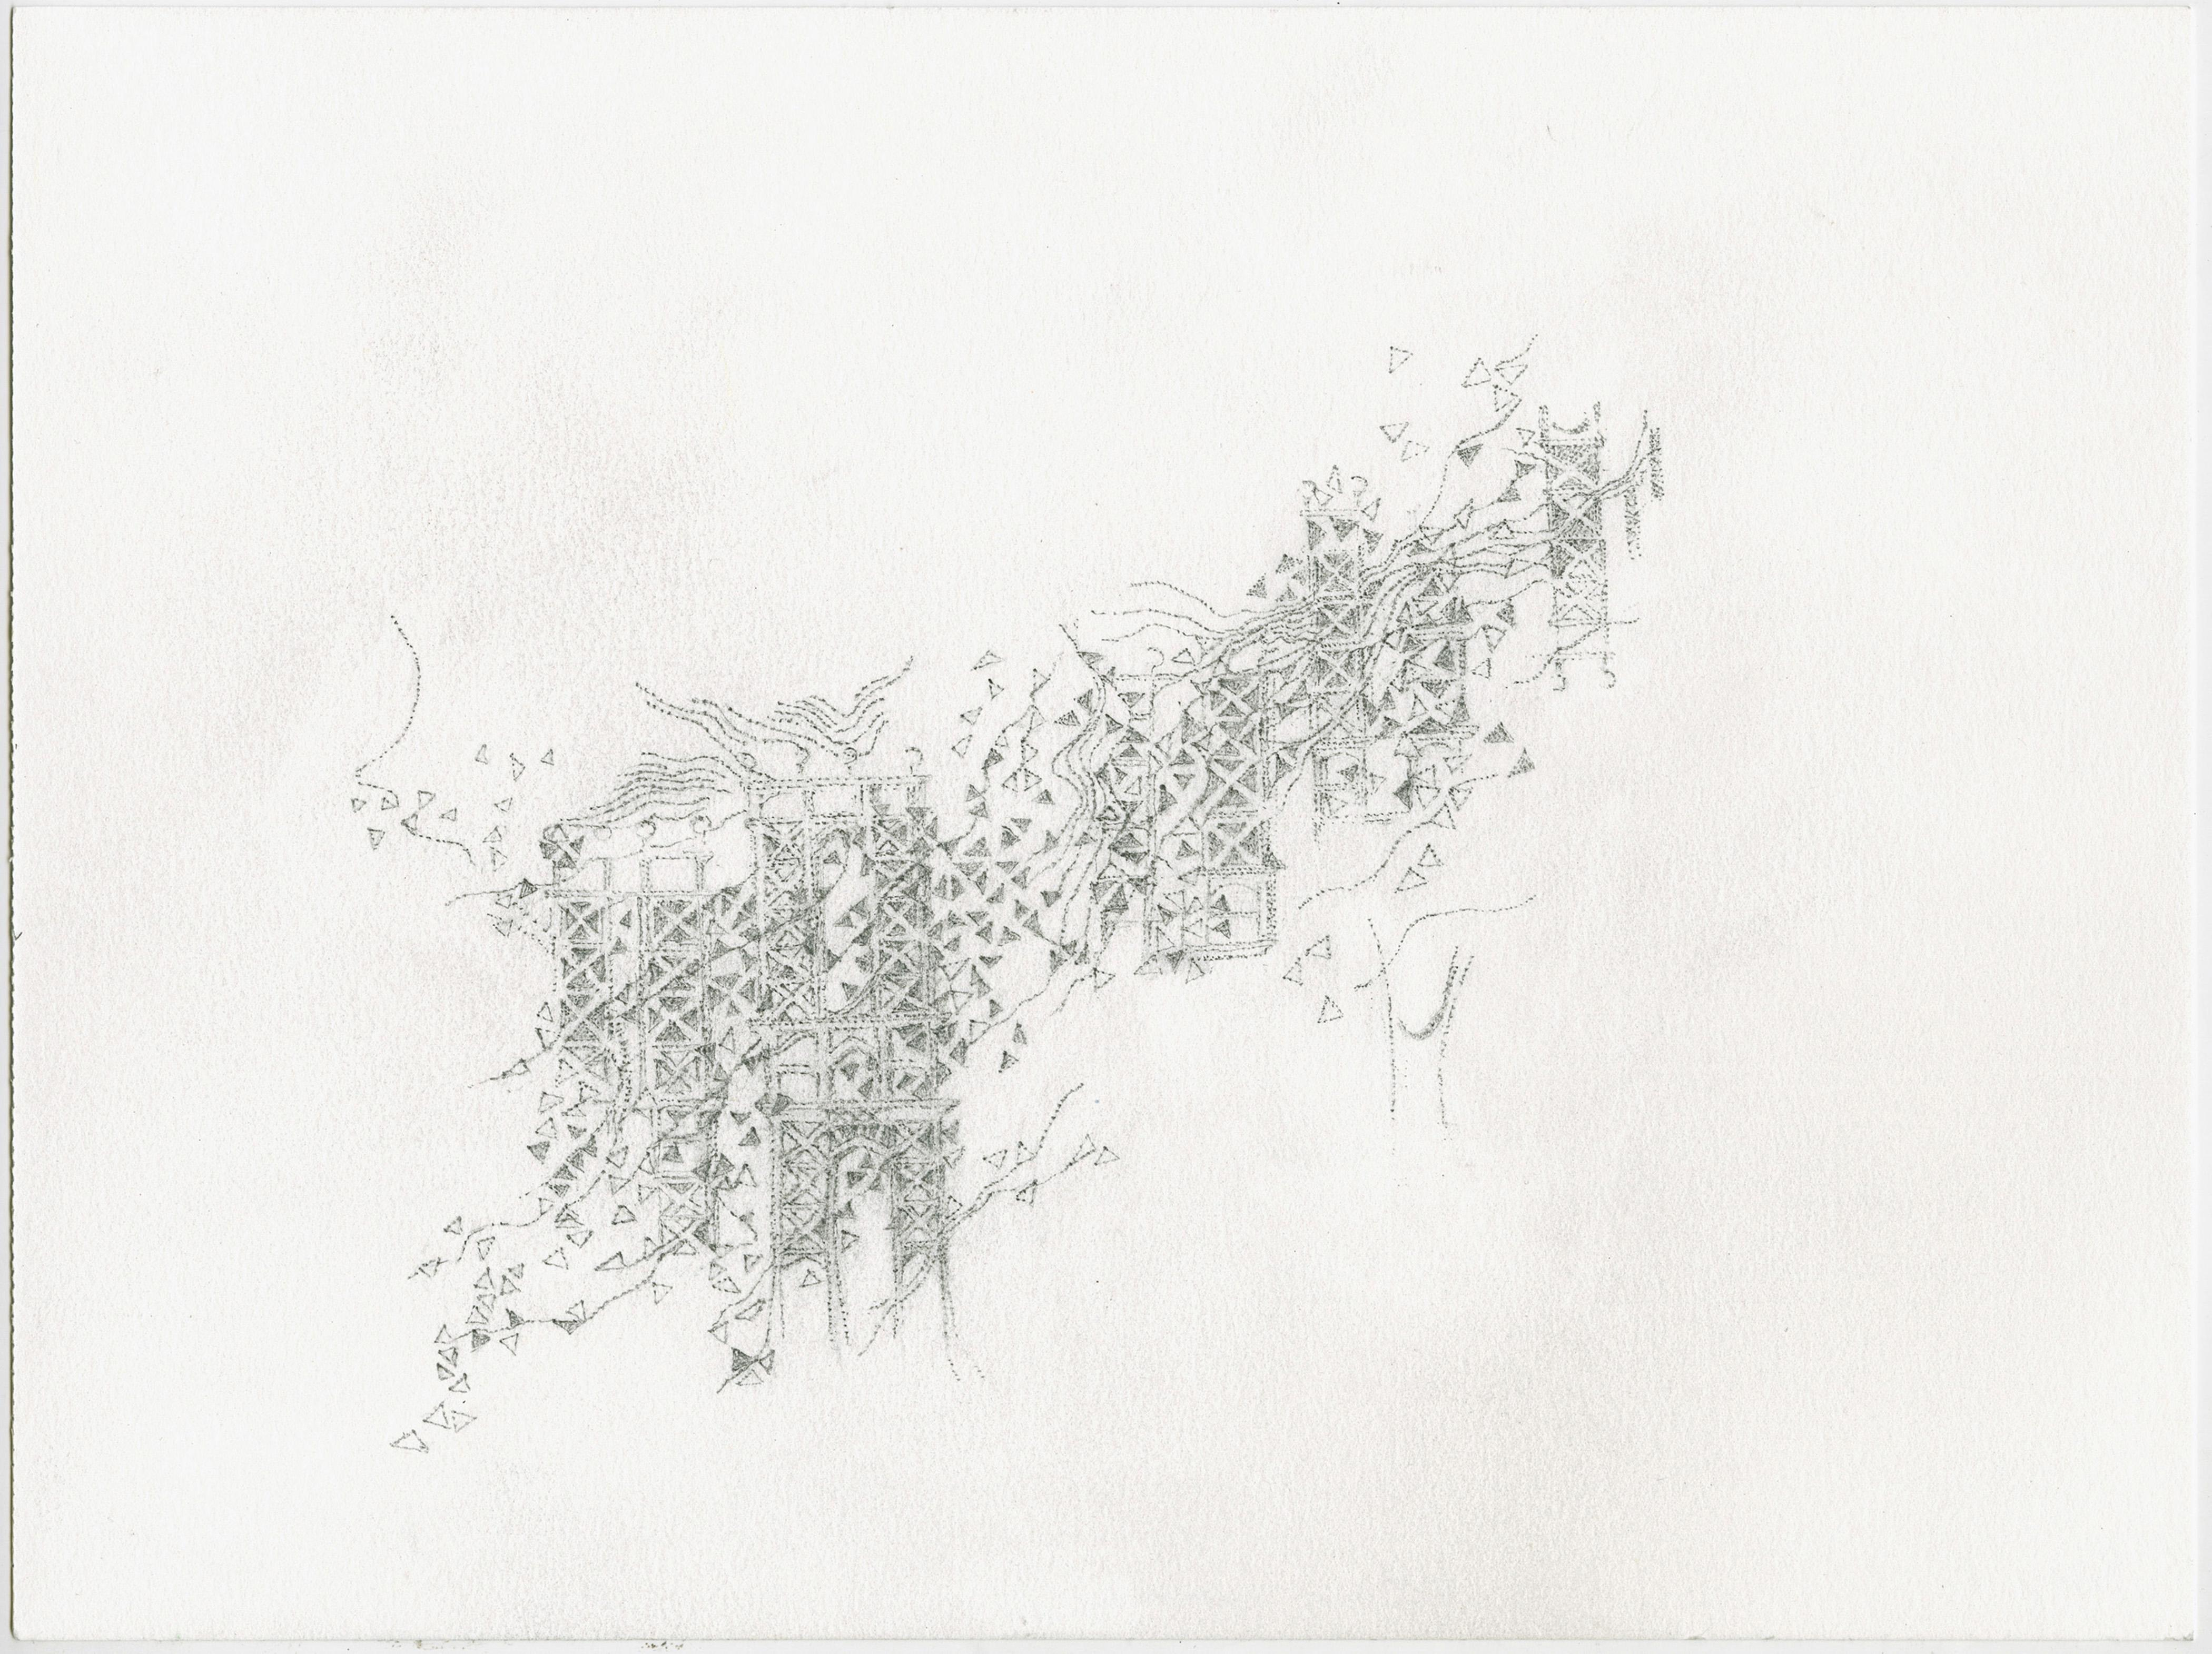 Katherine Jackson, Suspension of Disbelief, 2015, Graphite, Paper, Framed